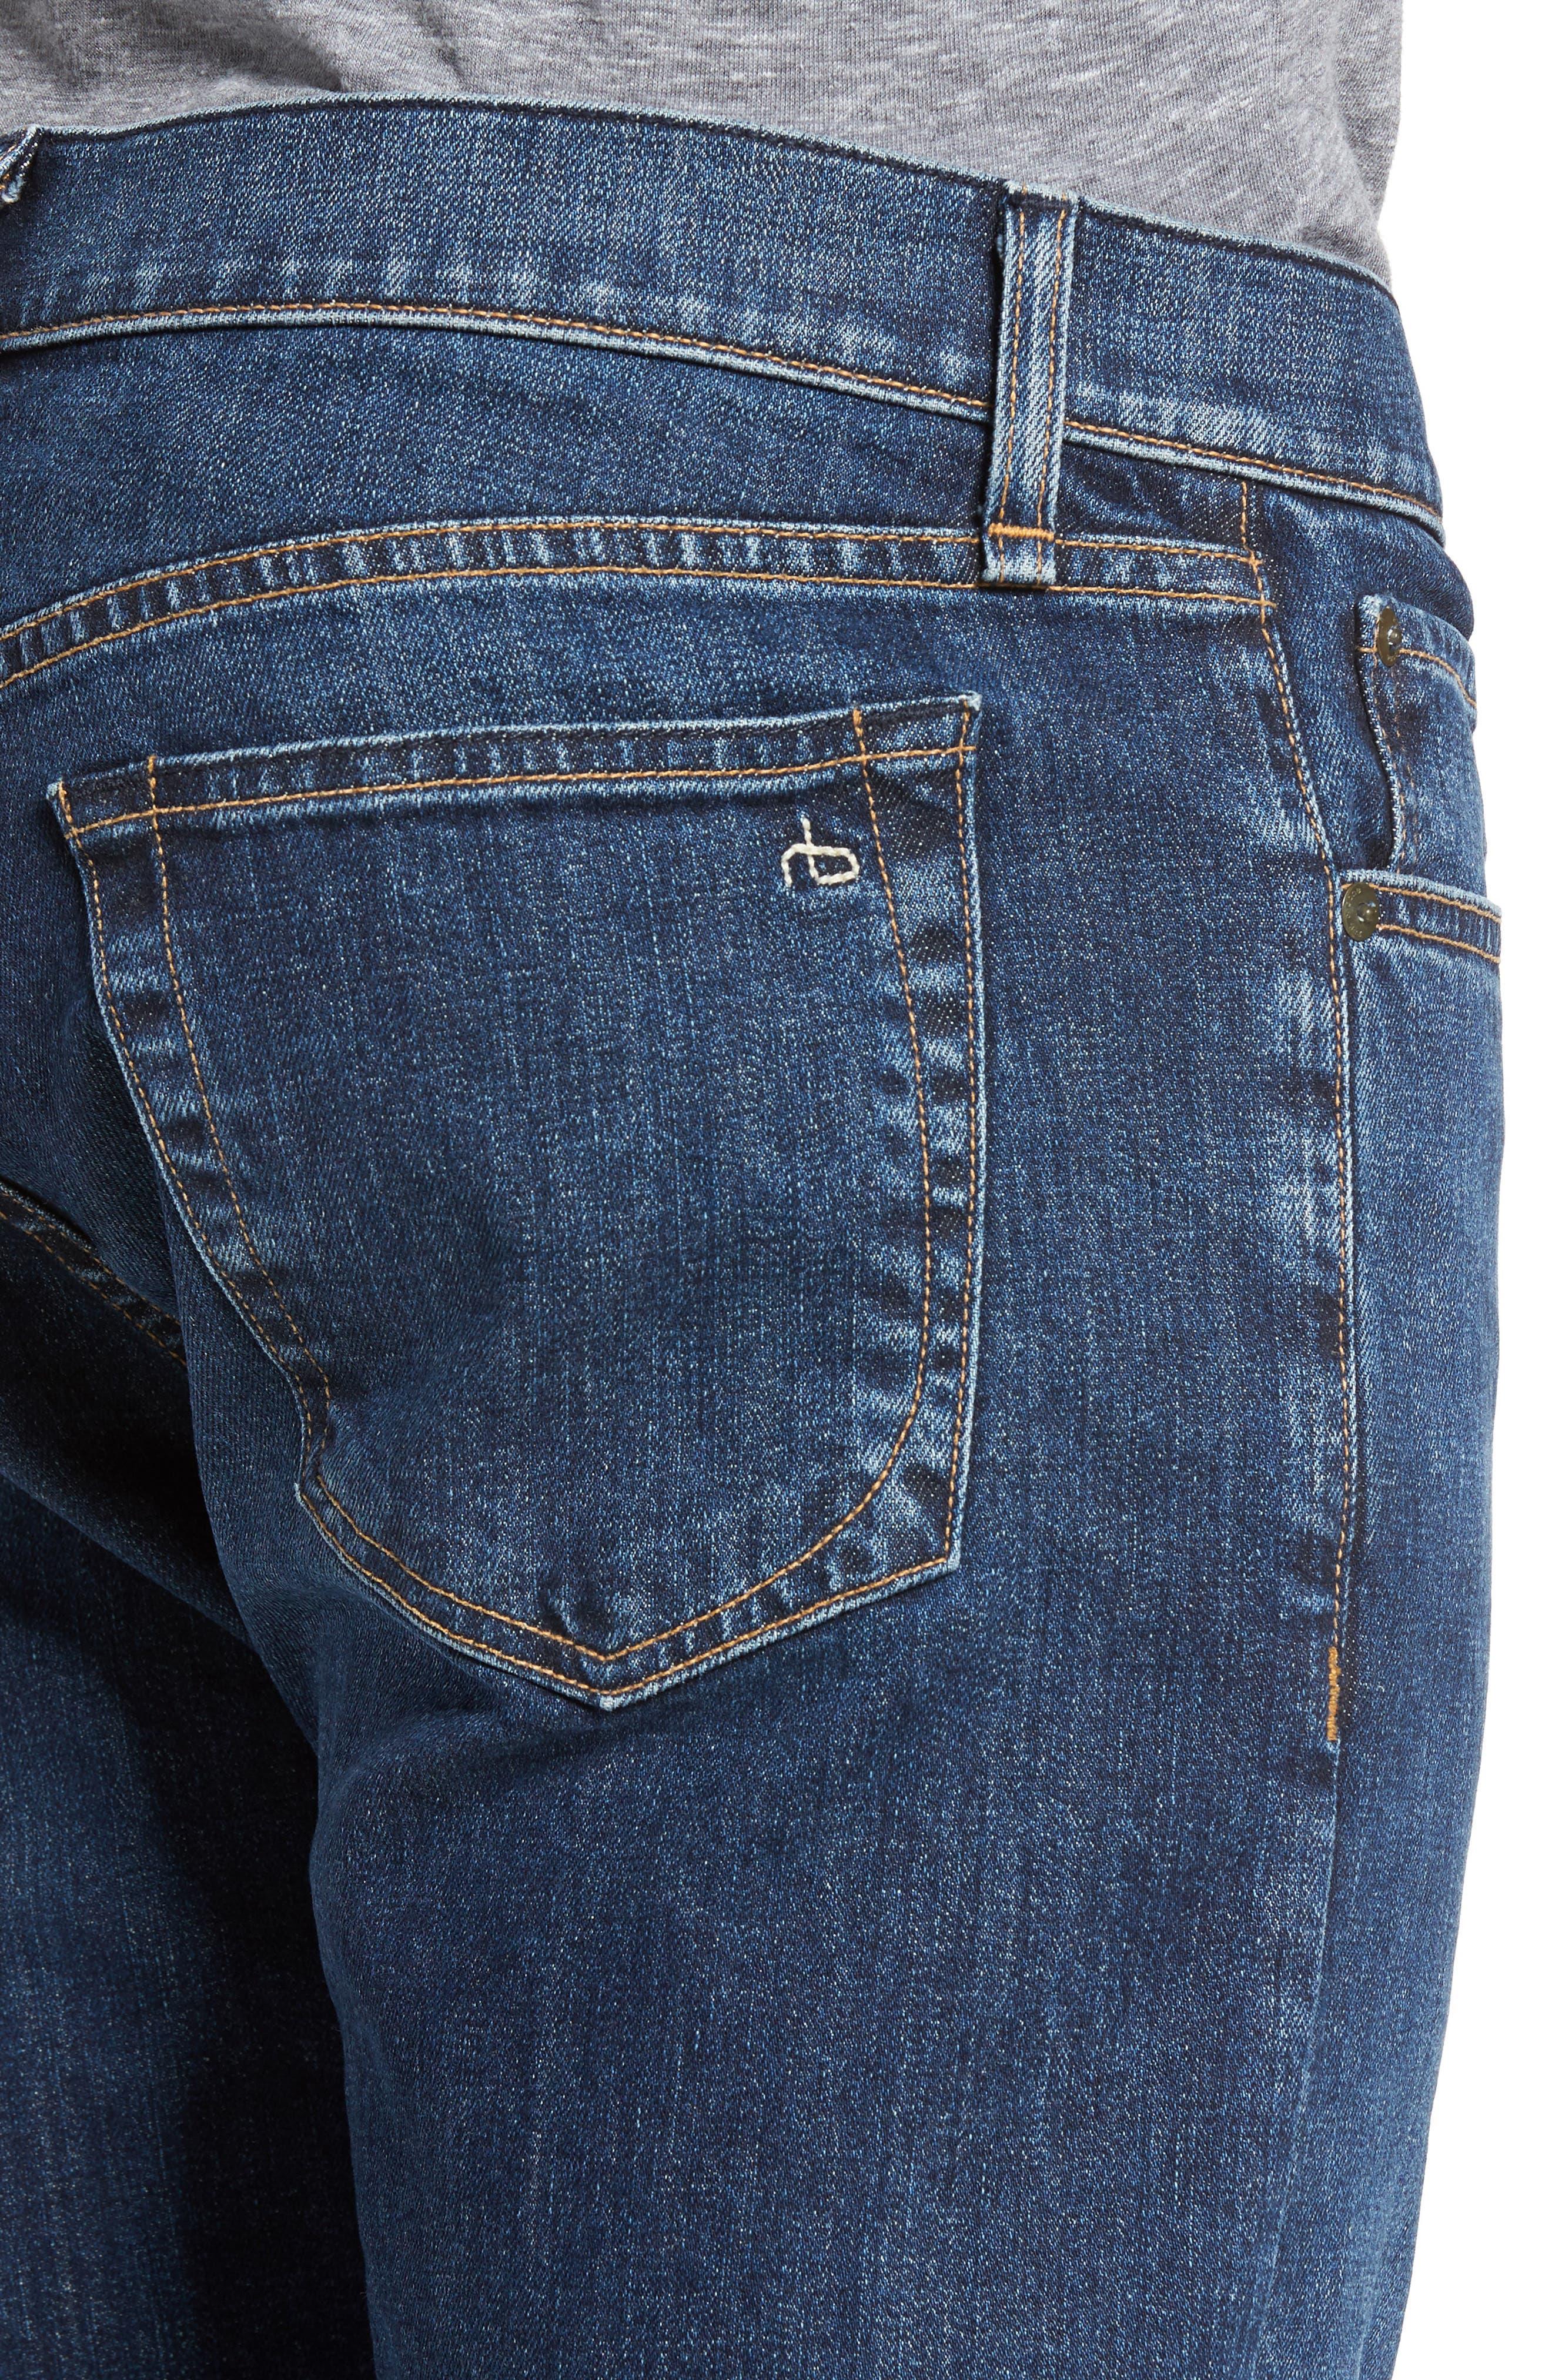 Fit 3 Slim Straight Leg Jeans,                             Alternate thumbnail 4, color,                             423